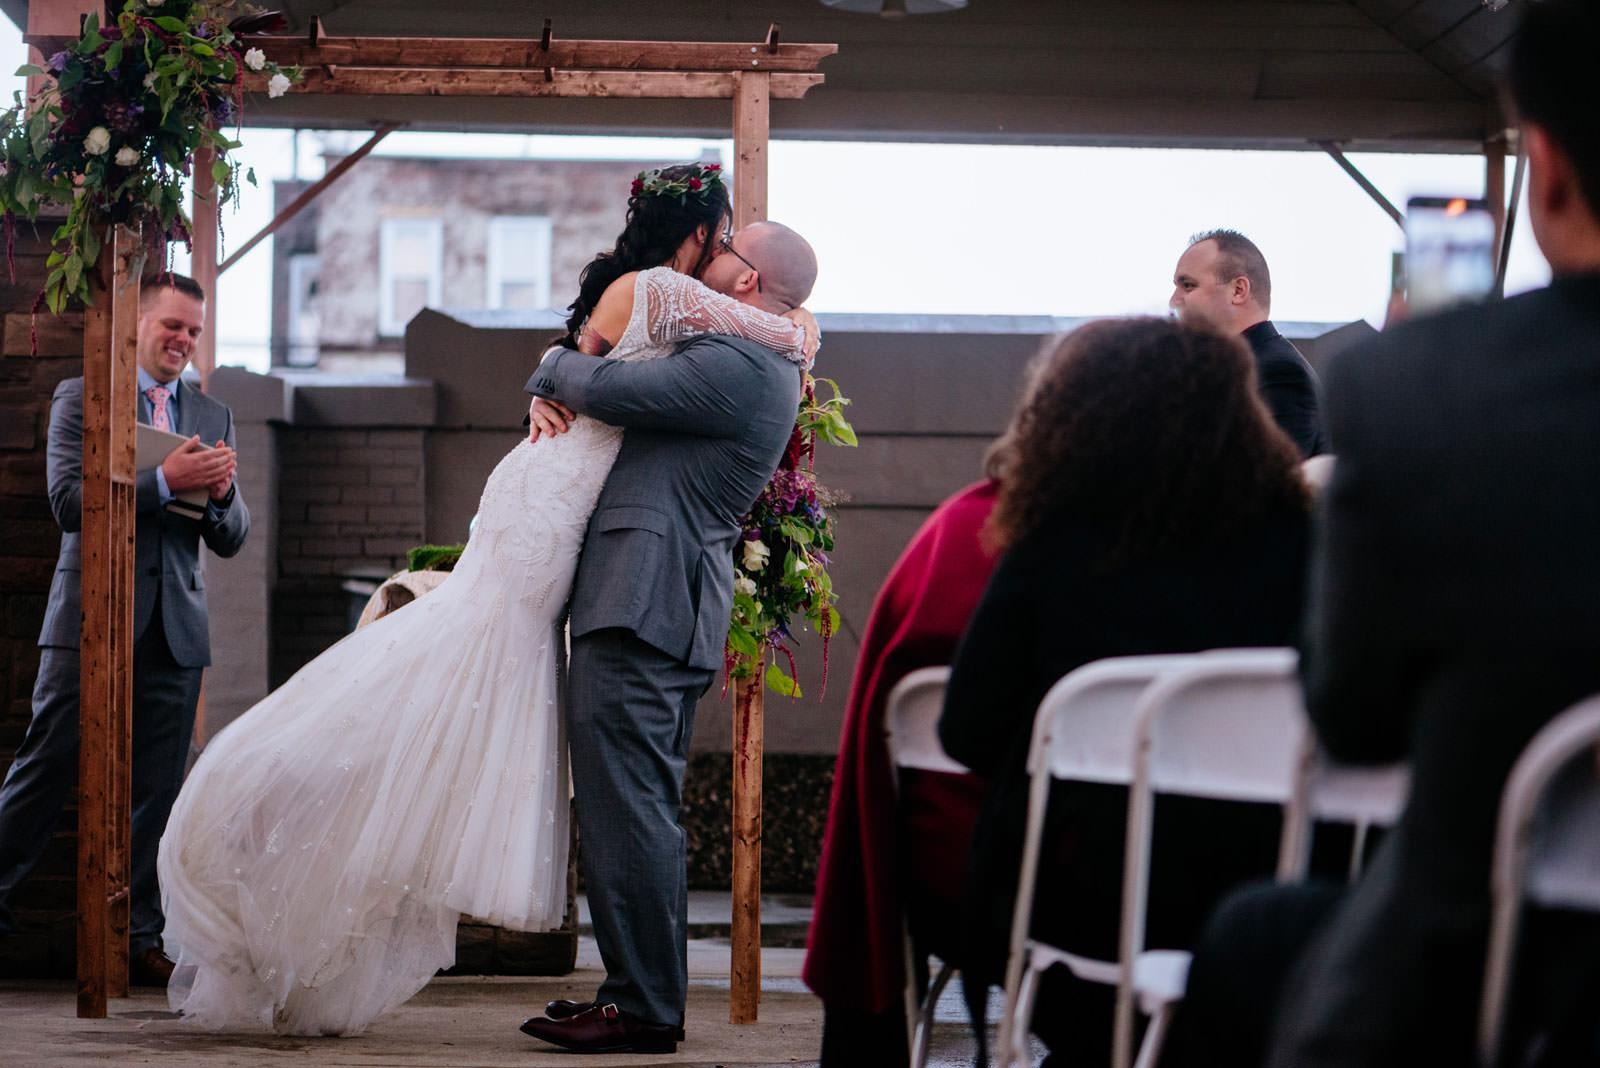 032groom Hugs Bride After Wedding Ceremony Morgantown Wv Wedding